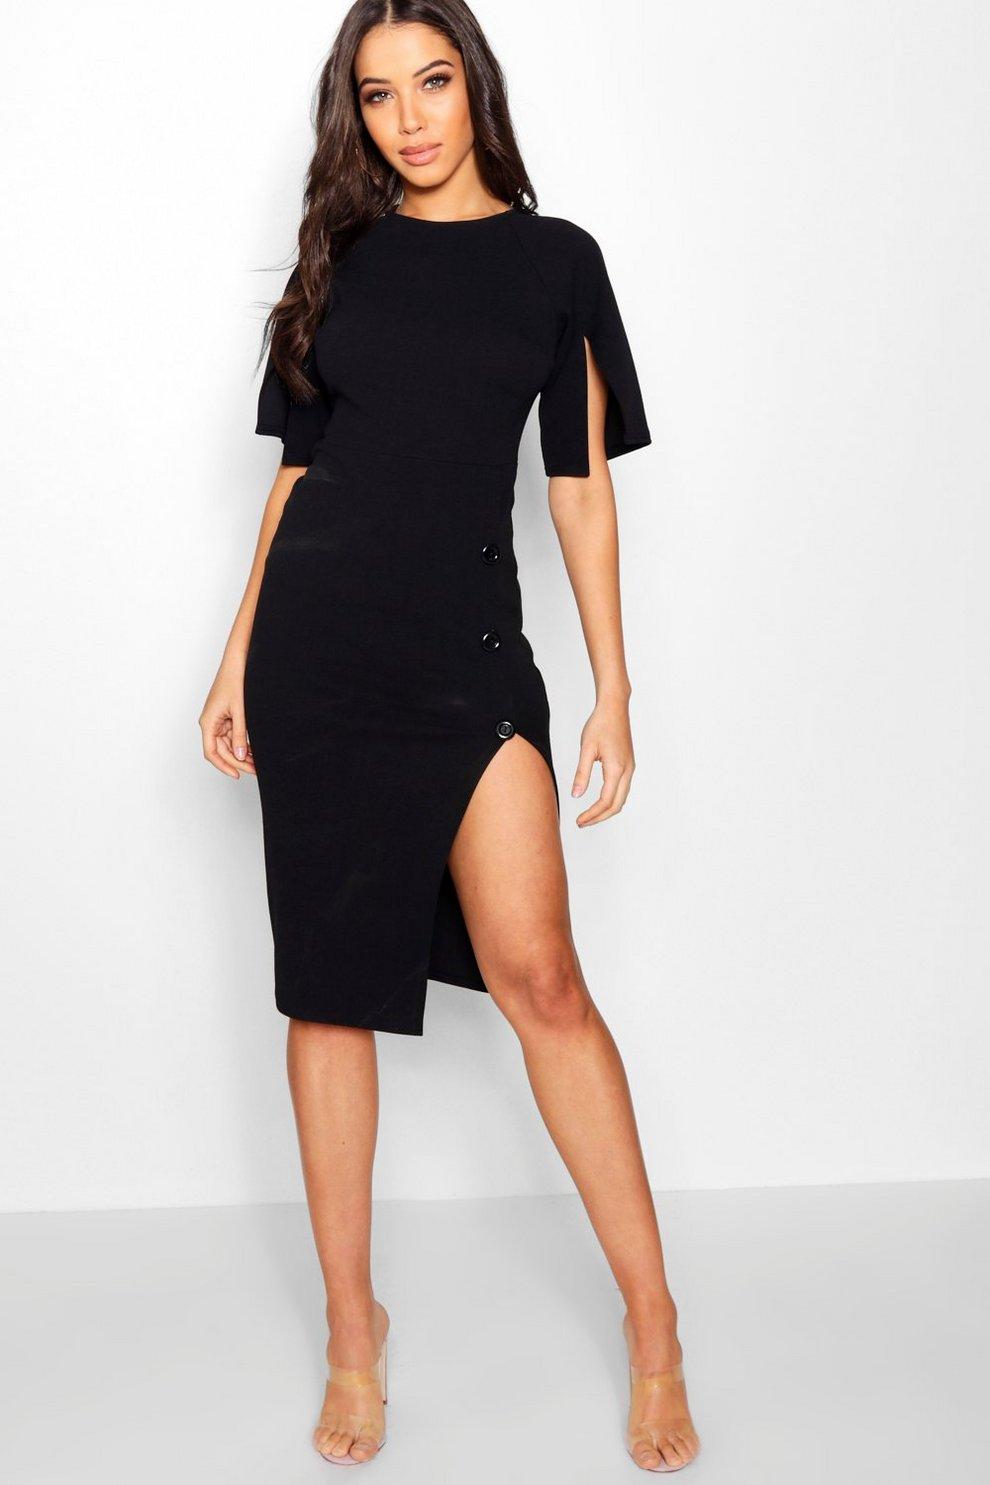 01aea6916354 Womens Black Split Sleeve Button Midi Dress. Hover to zoom